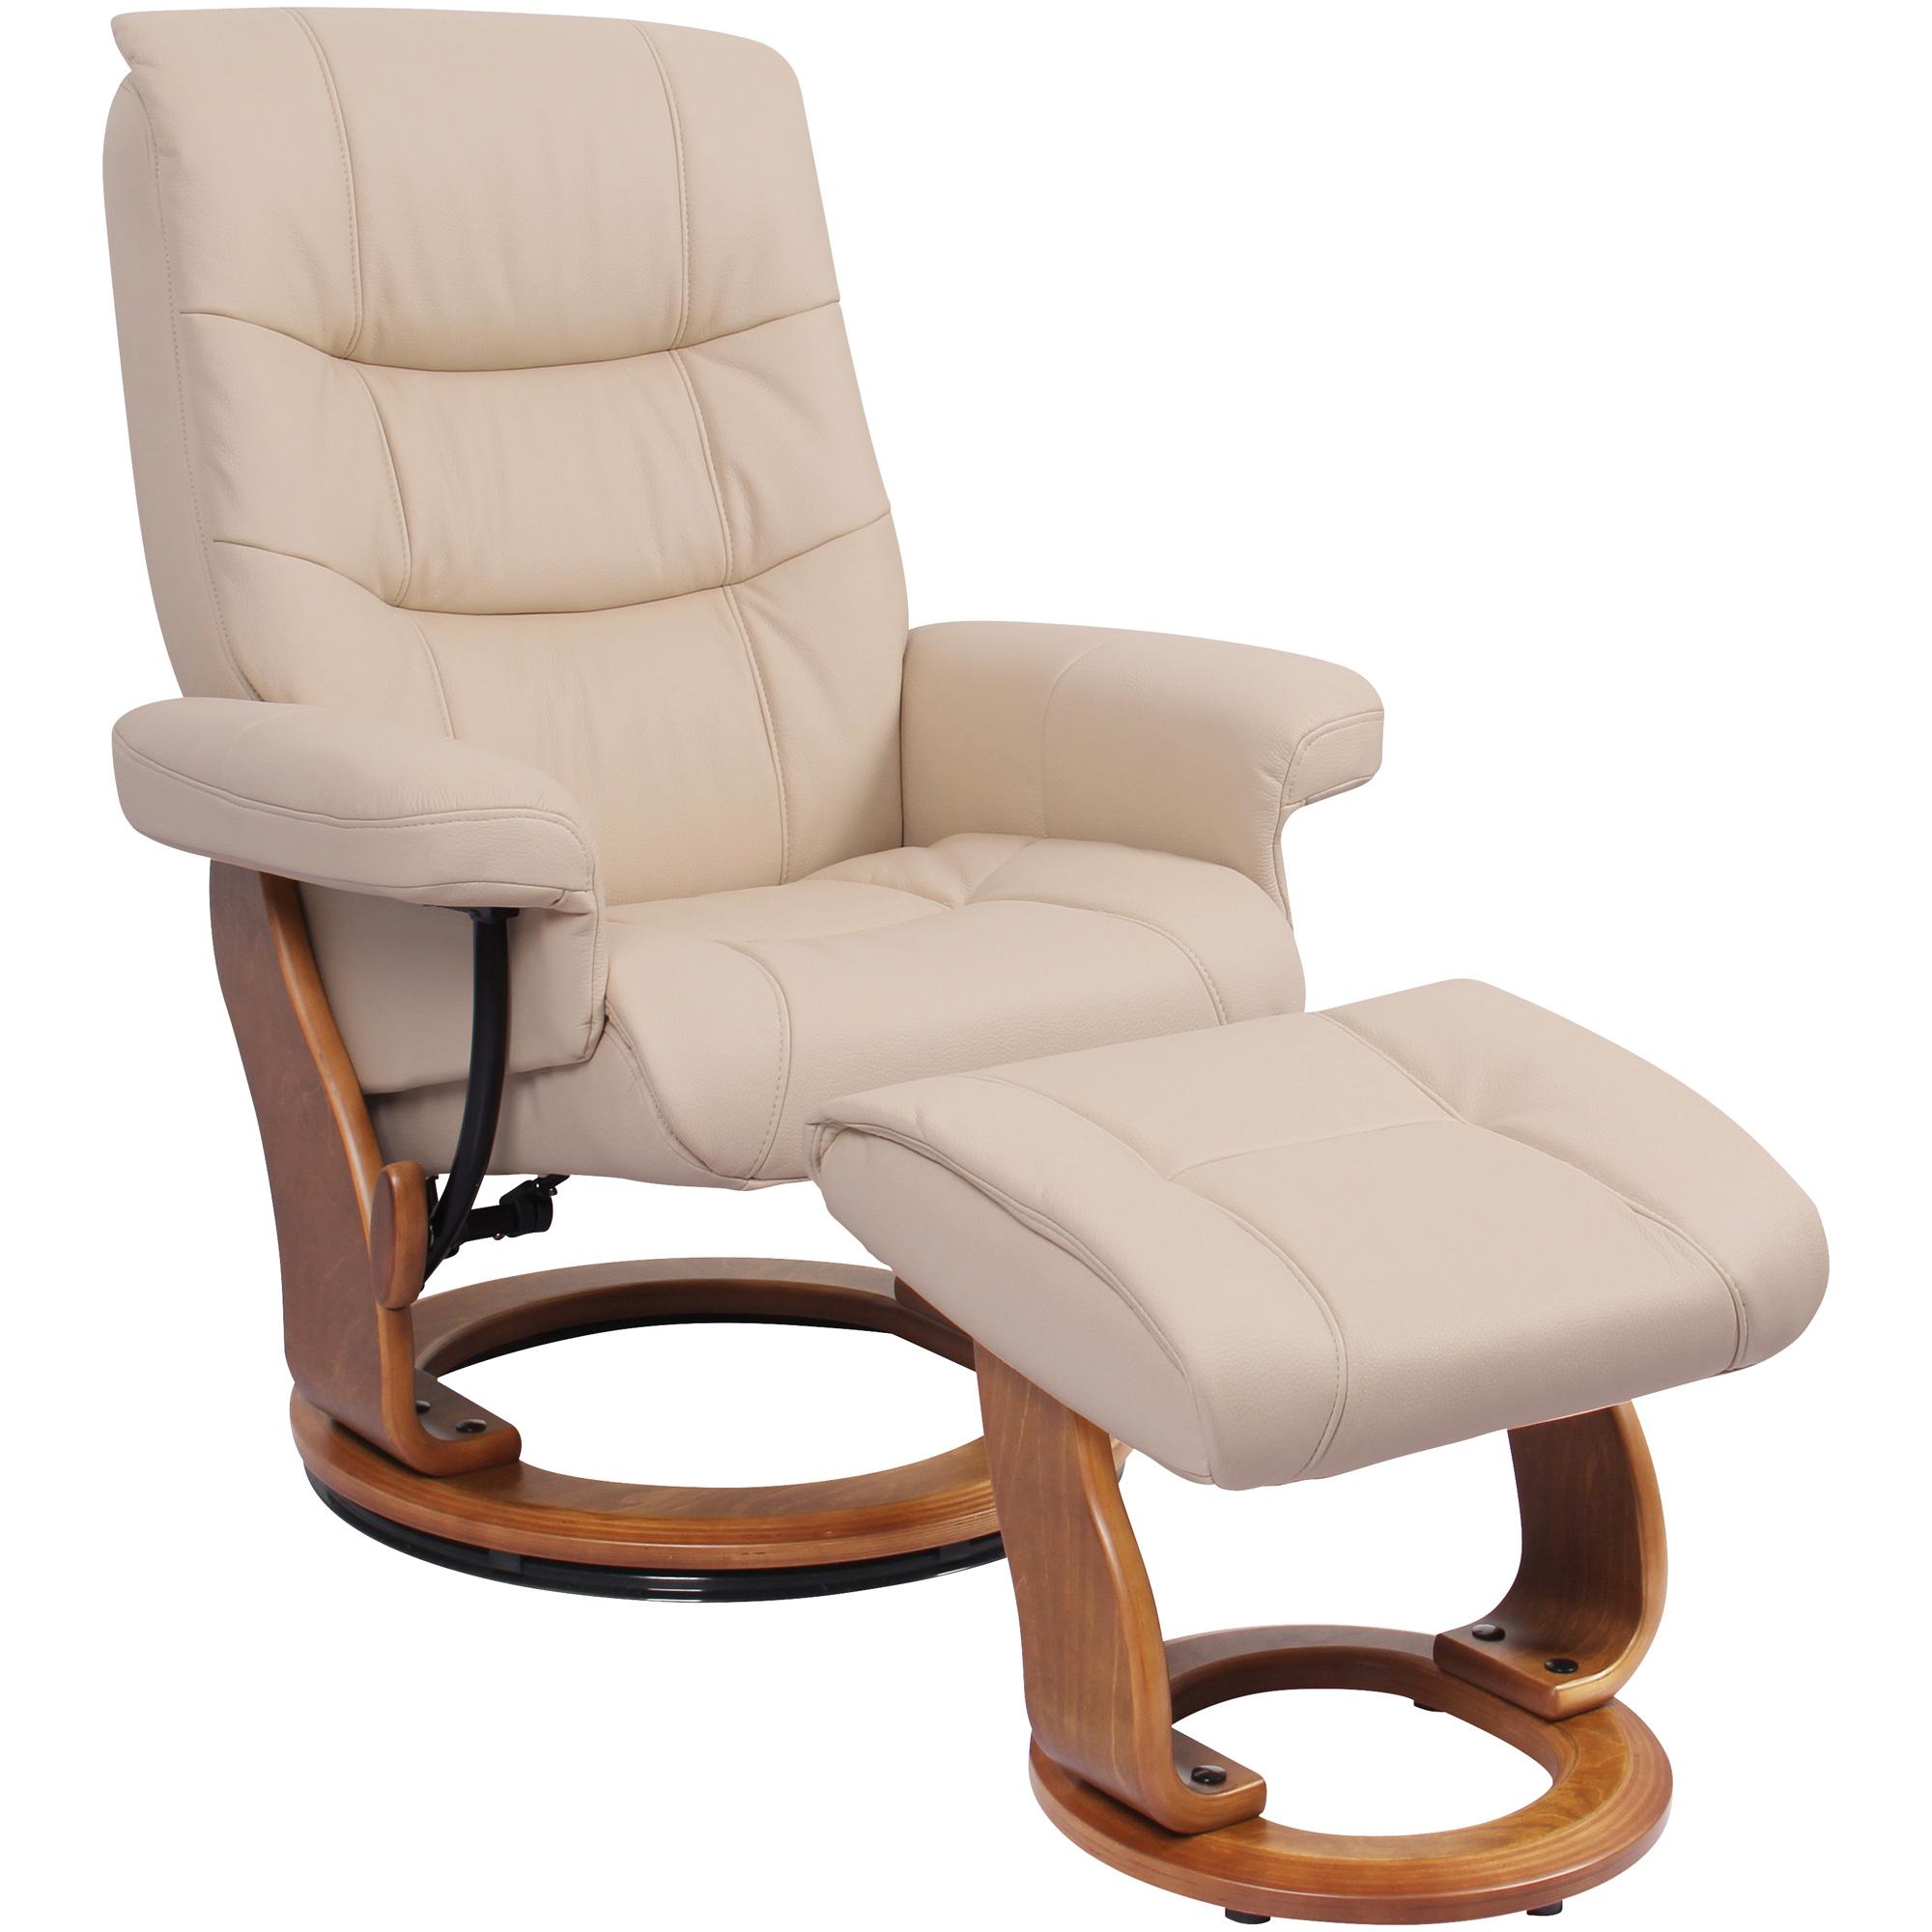 Benchmaster | Rosa II Khaki Recliner Chair